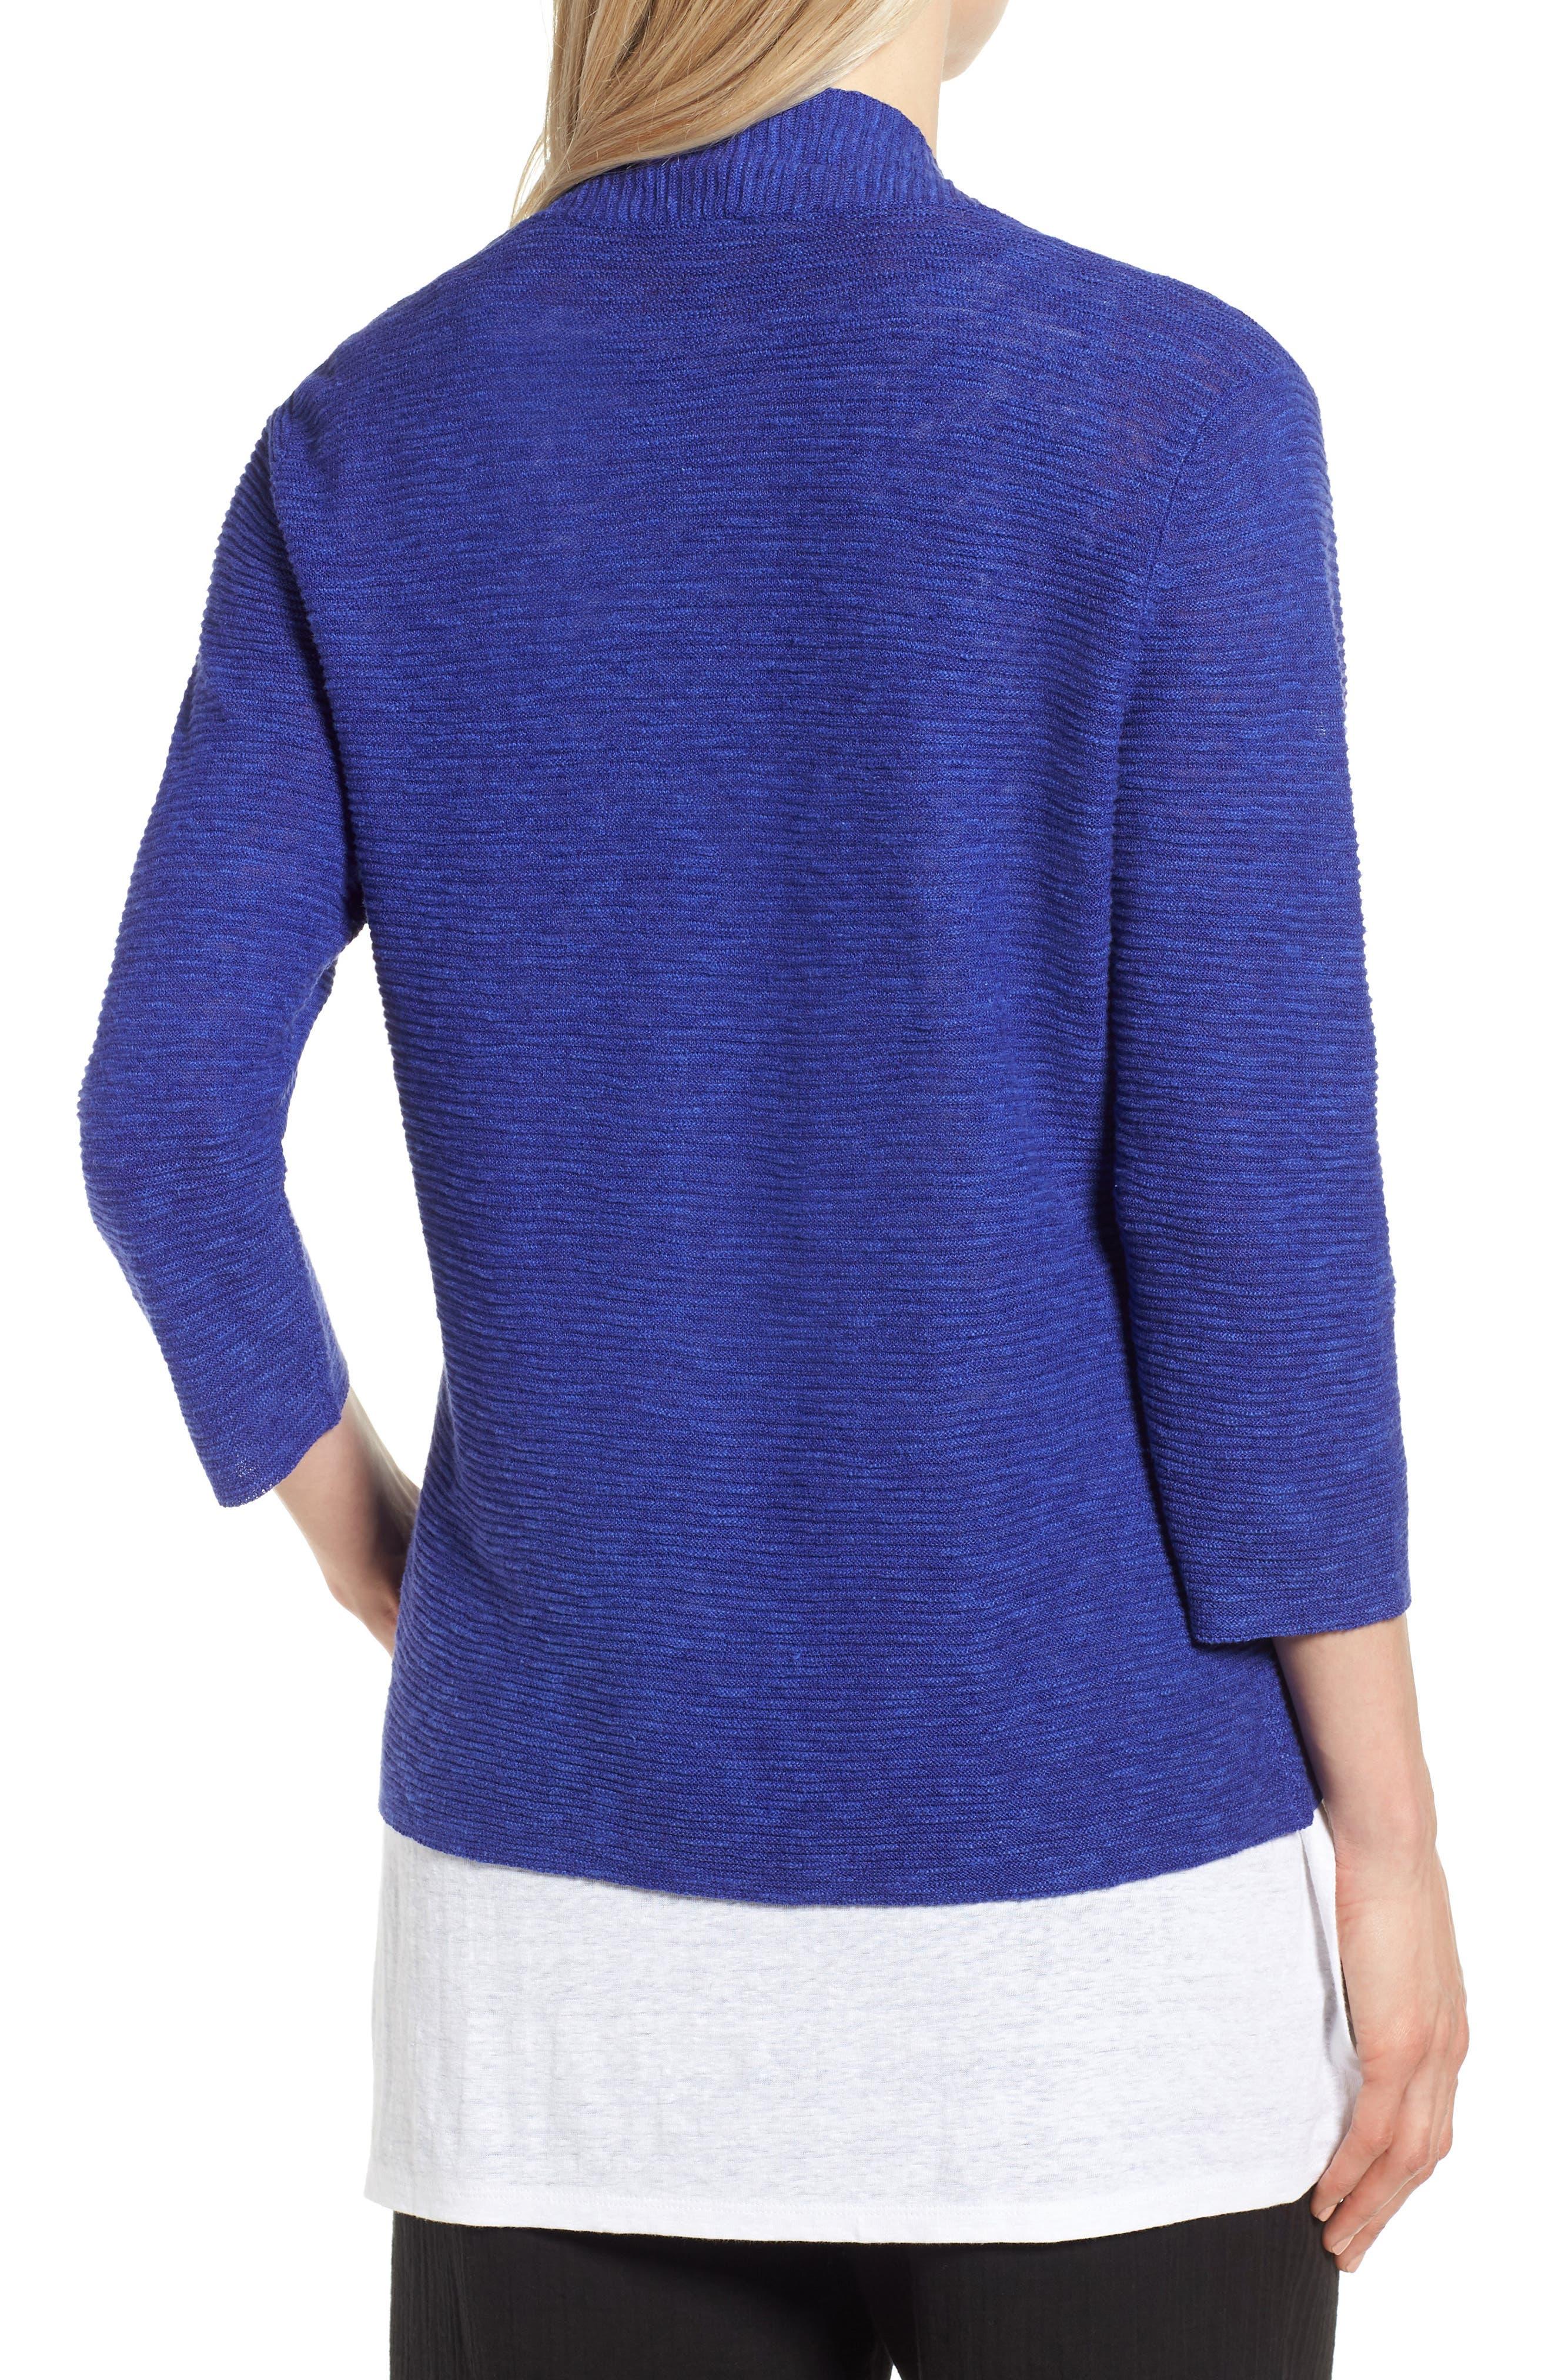 Simple Organic Linen & Cotton Cardigan,                             Alternate thumbnail 6, color,